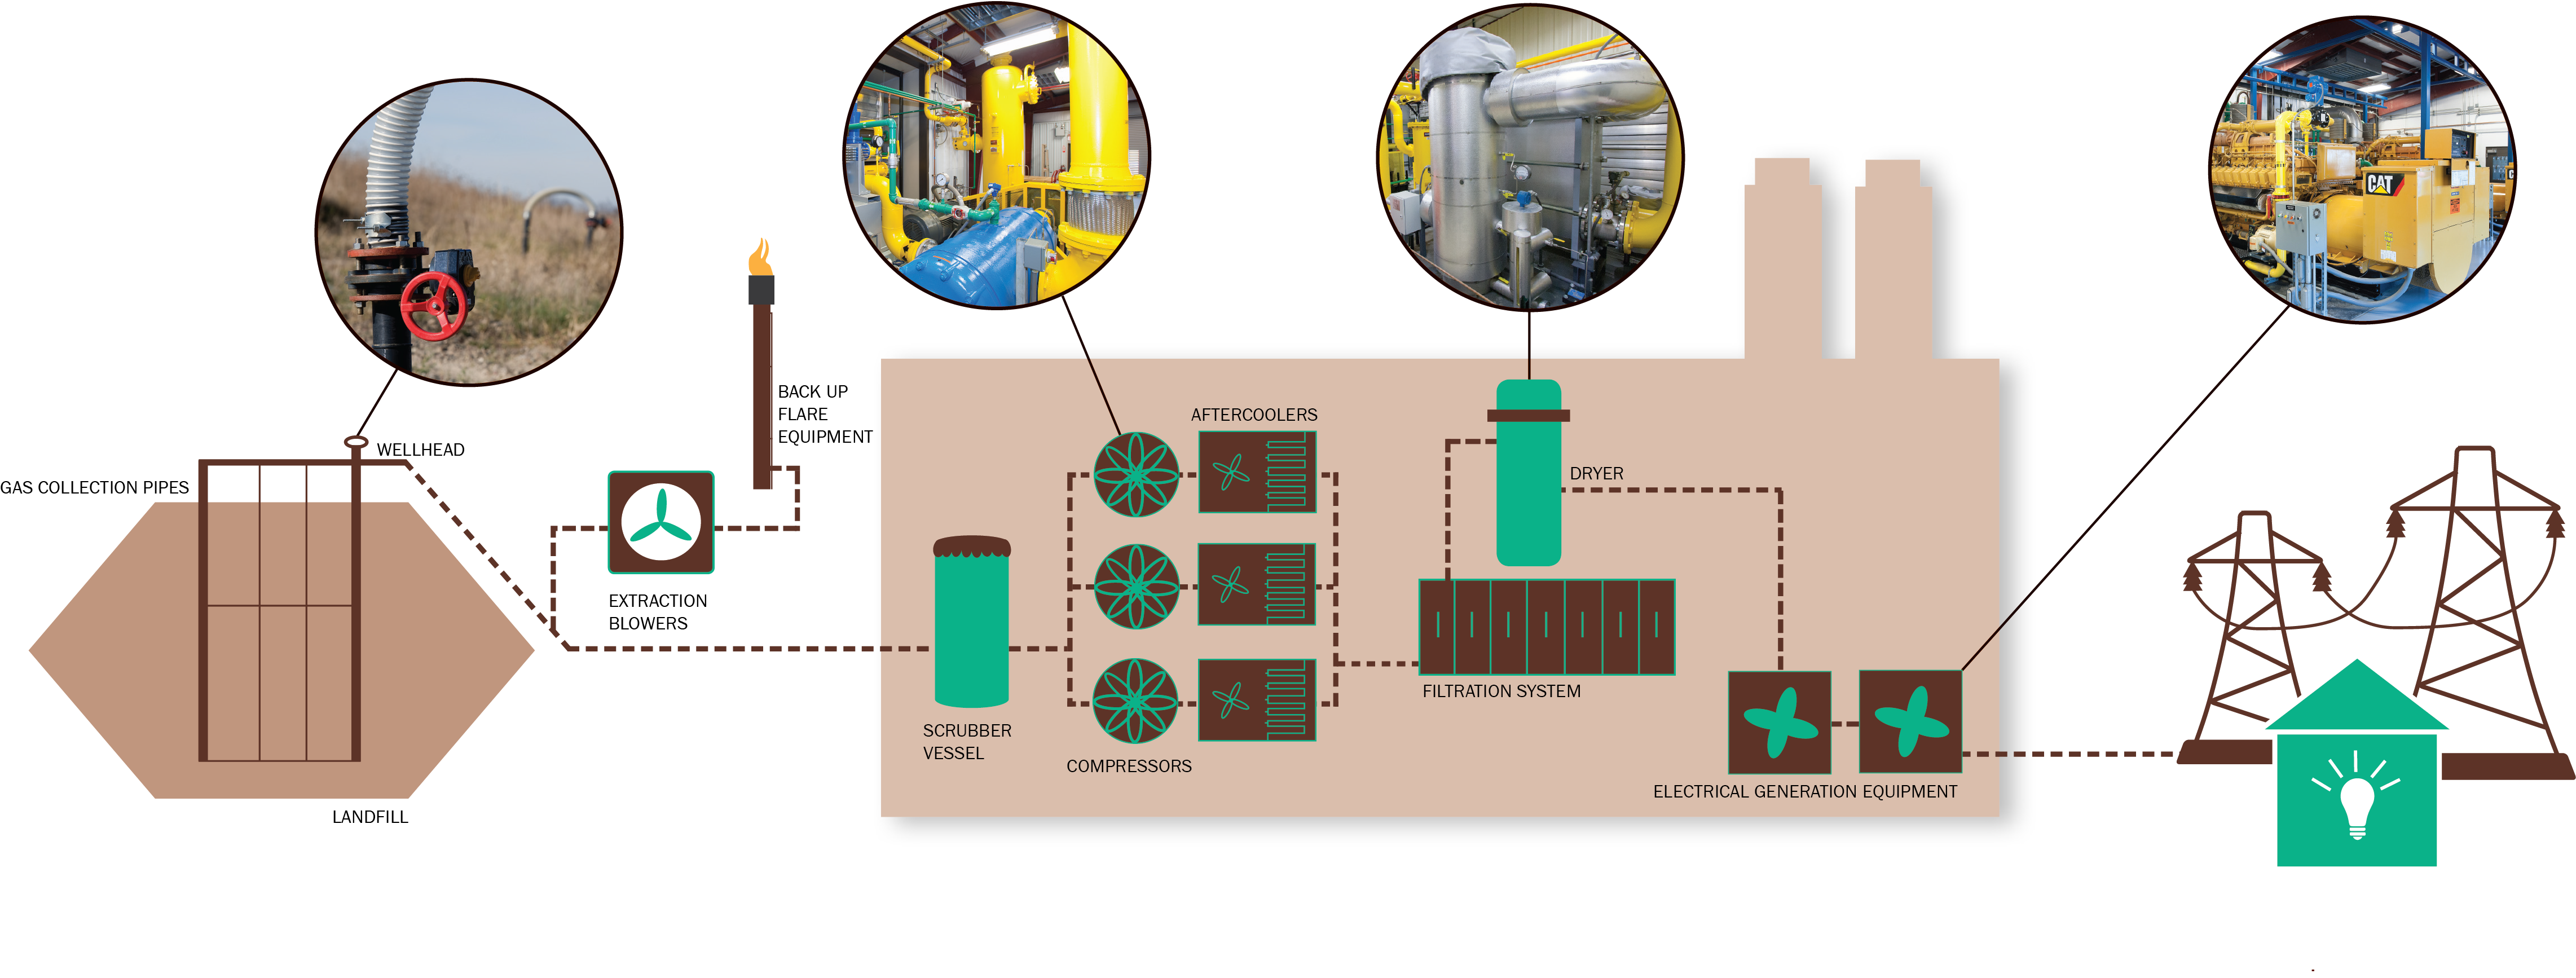 Wood Road Generating Station process